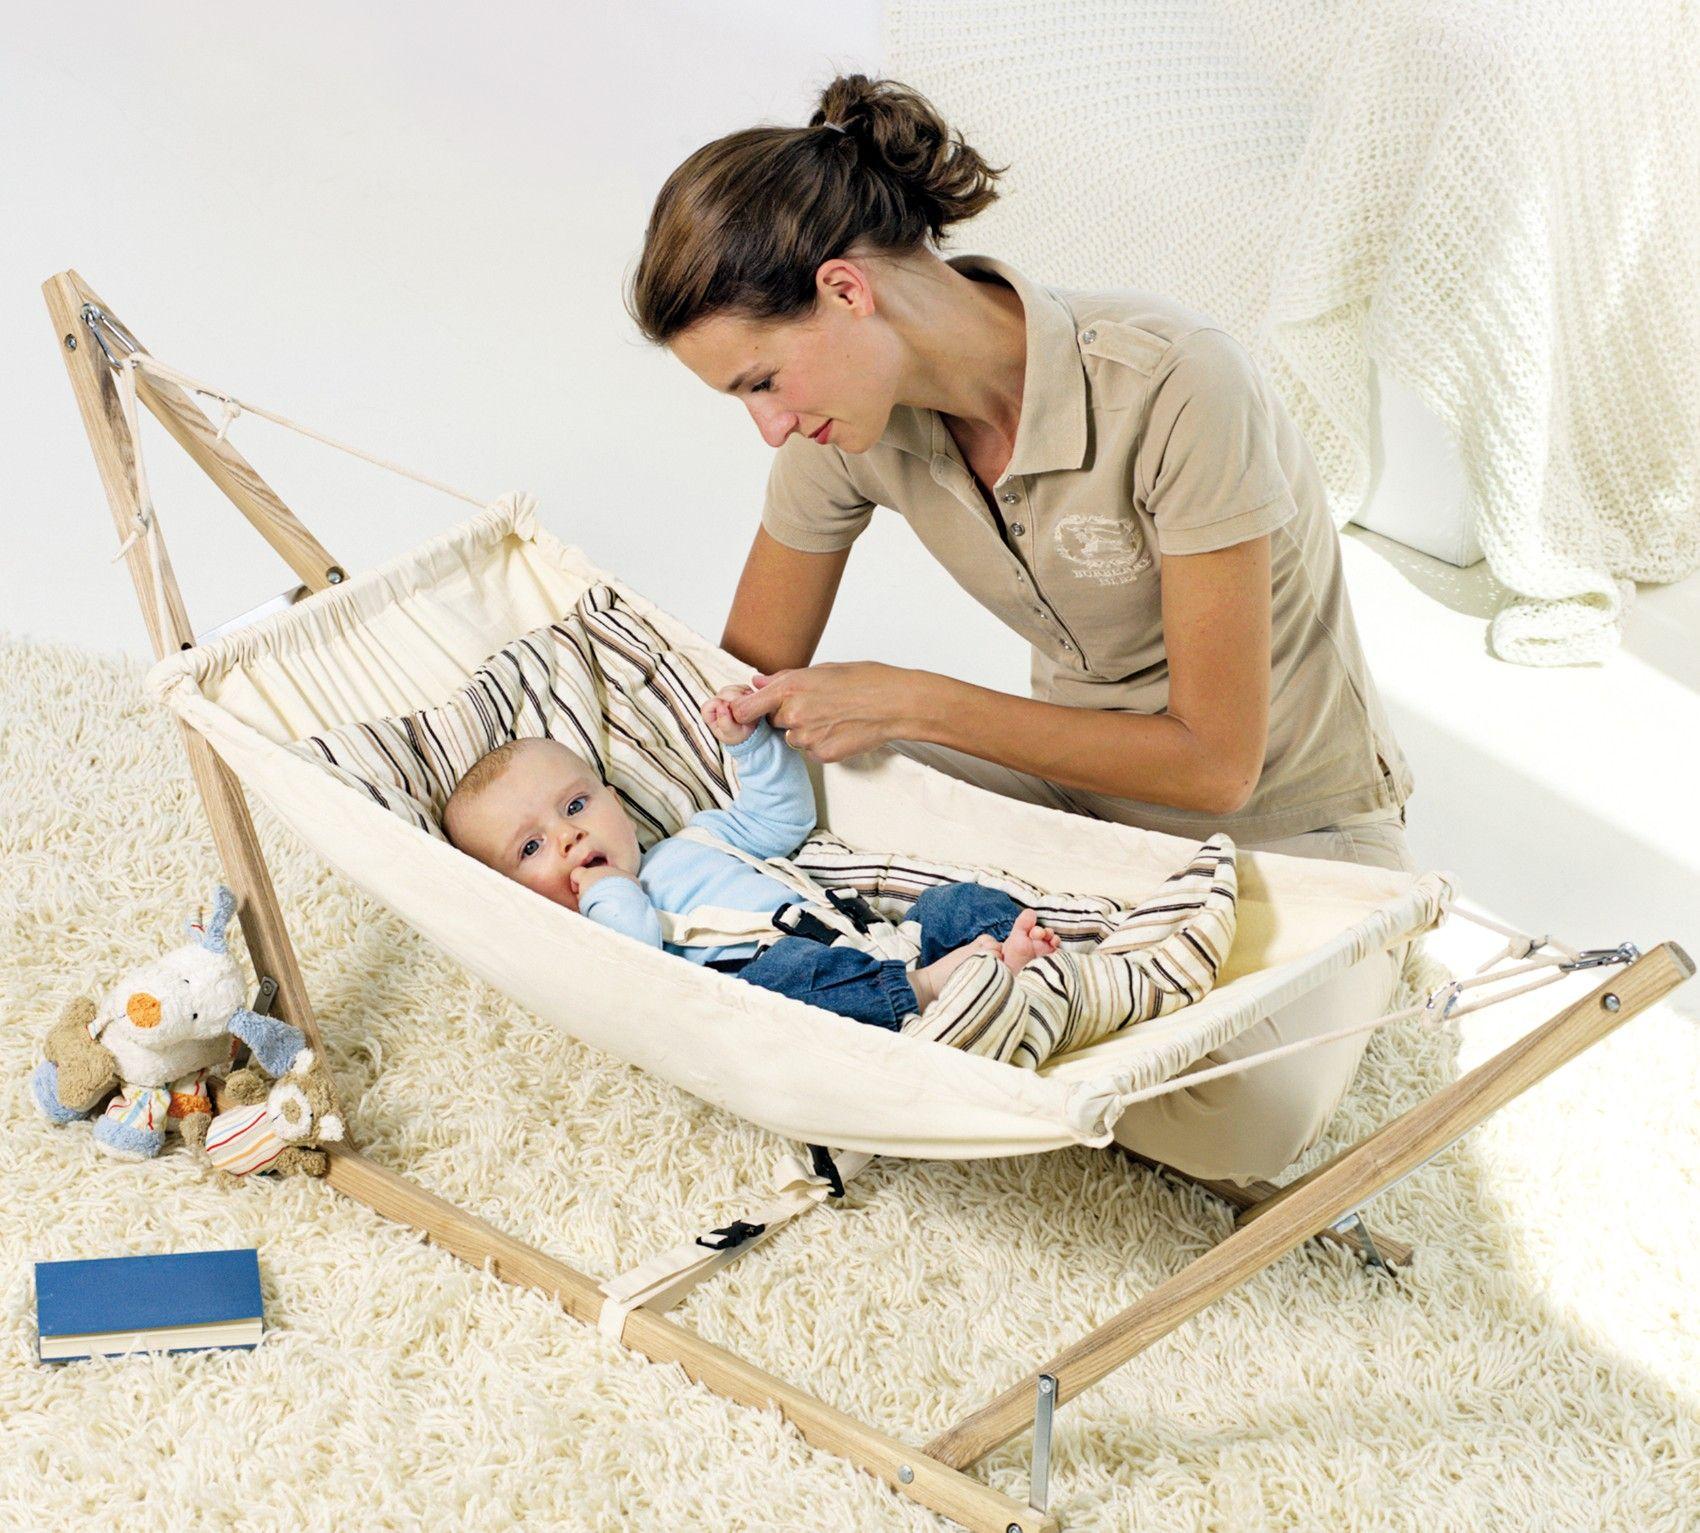 Baby Hangematte Mit Gestell Koala Amazonas Mytoys De Baby Hangematte Hangematte Fur Baby Wiege Baby